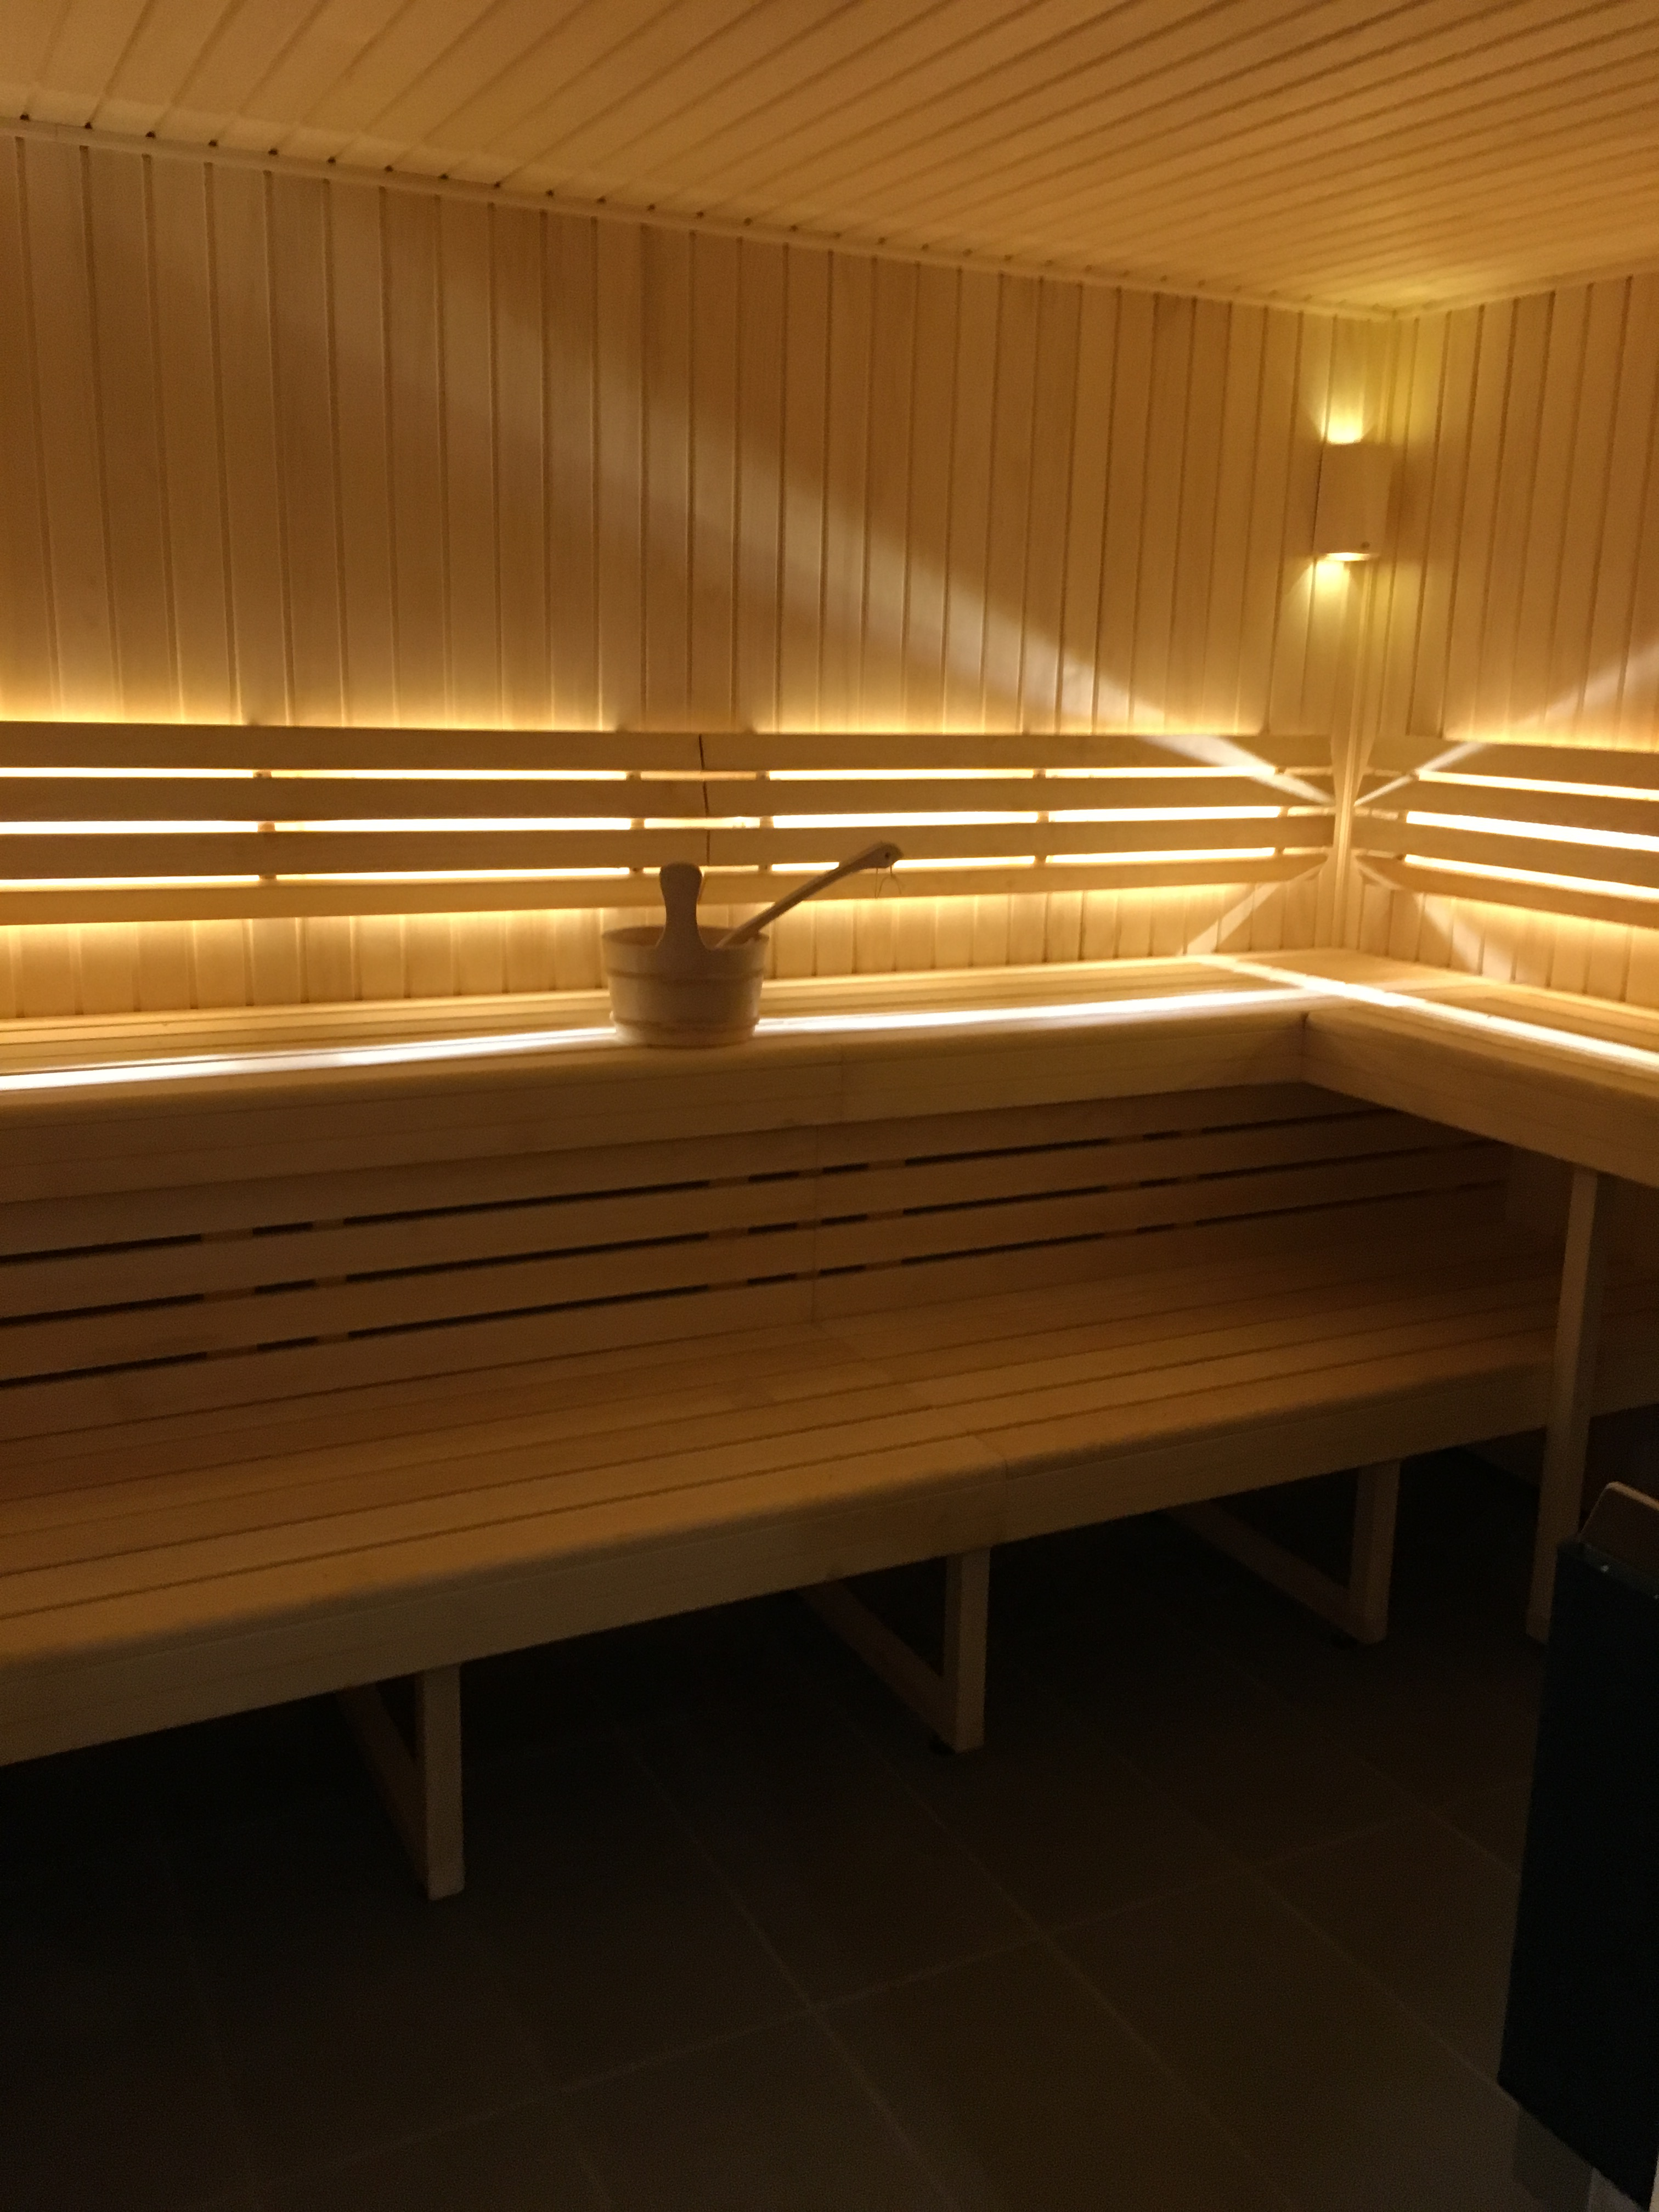 Sauna sur mesure - Aquafit Arras Image 1